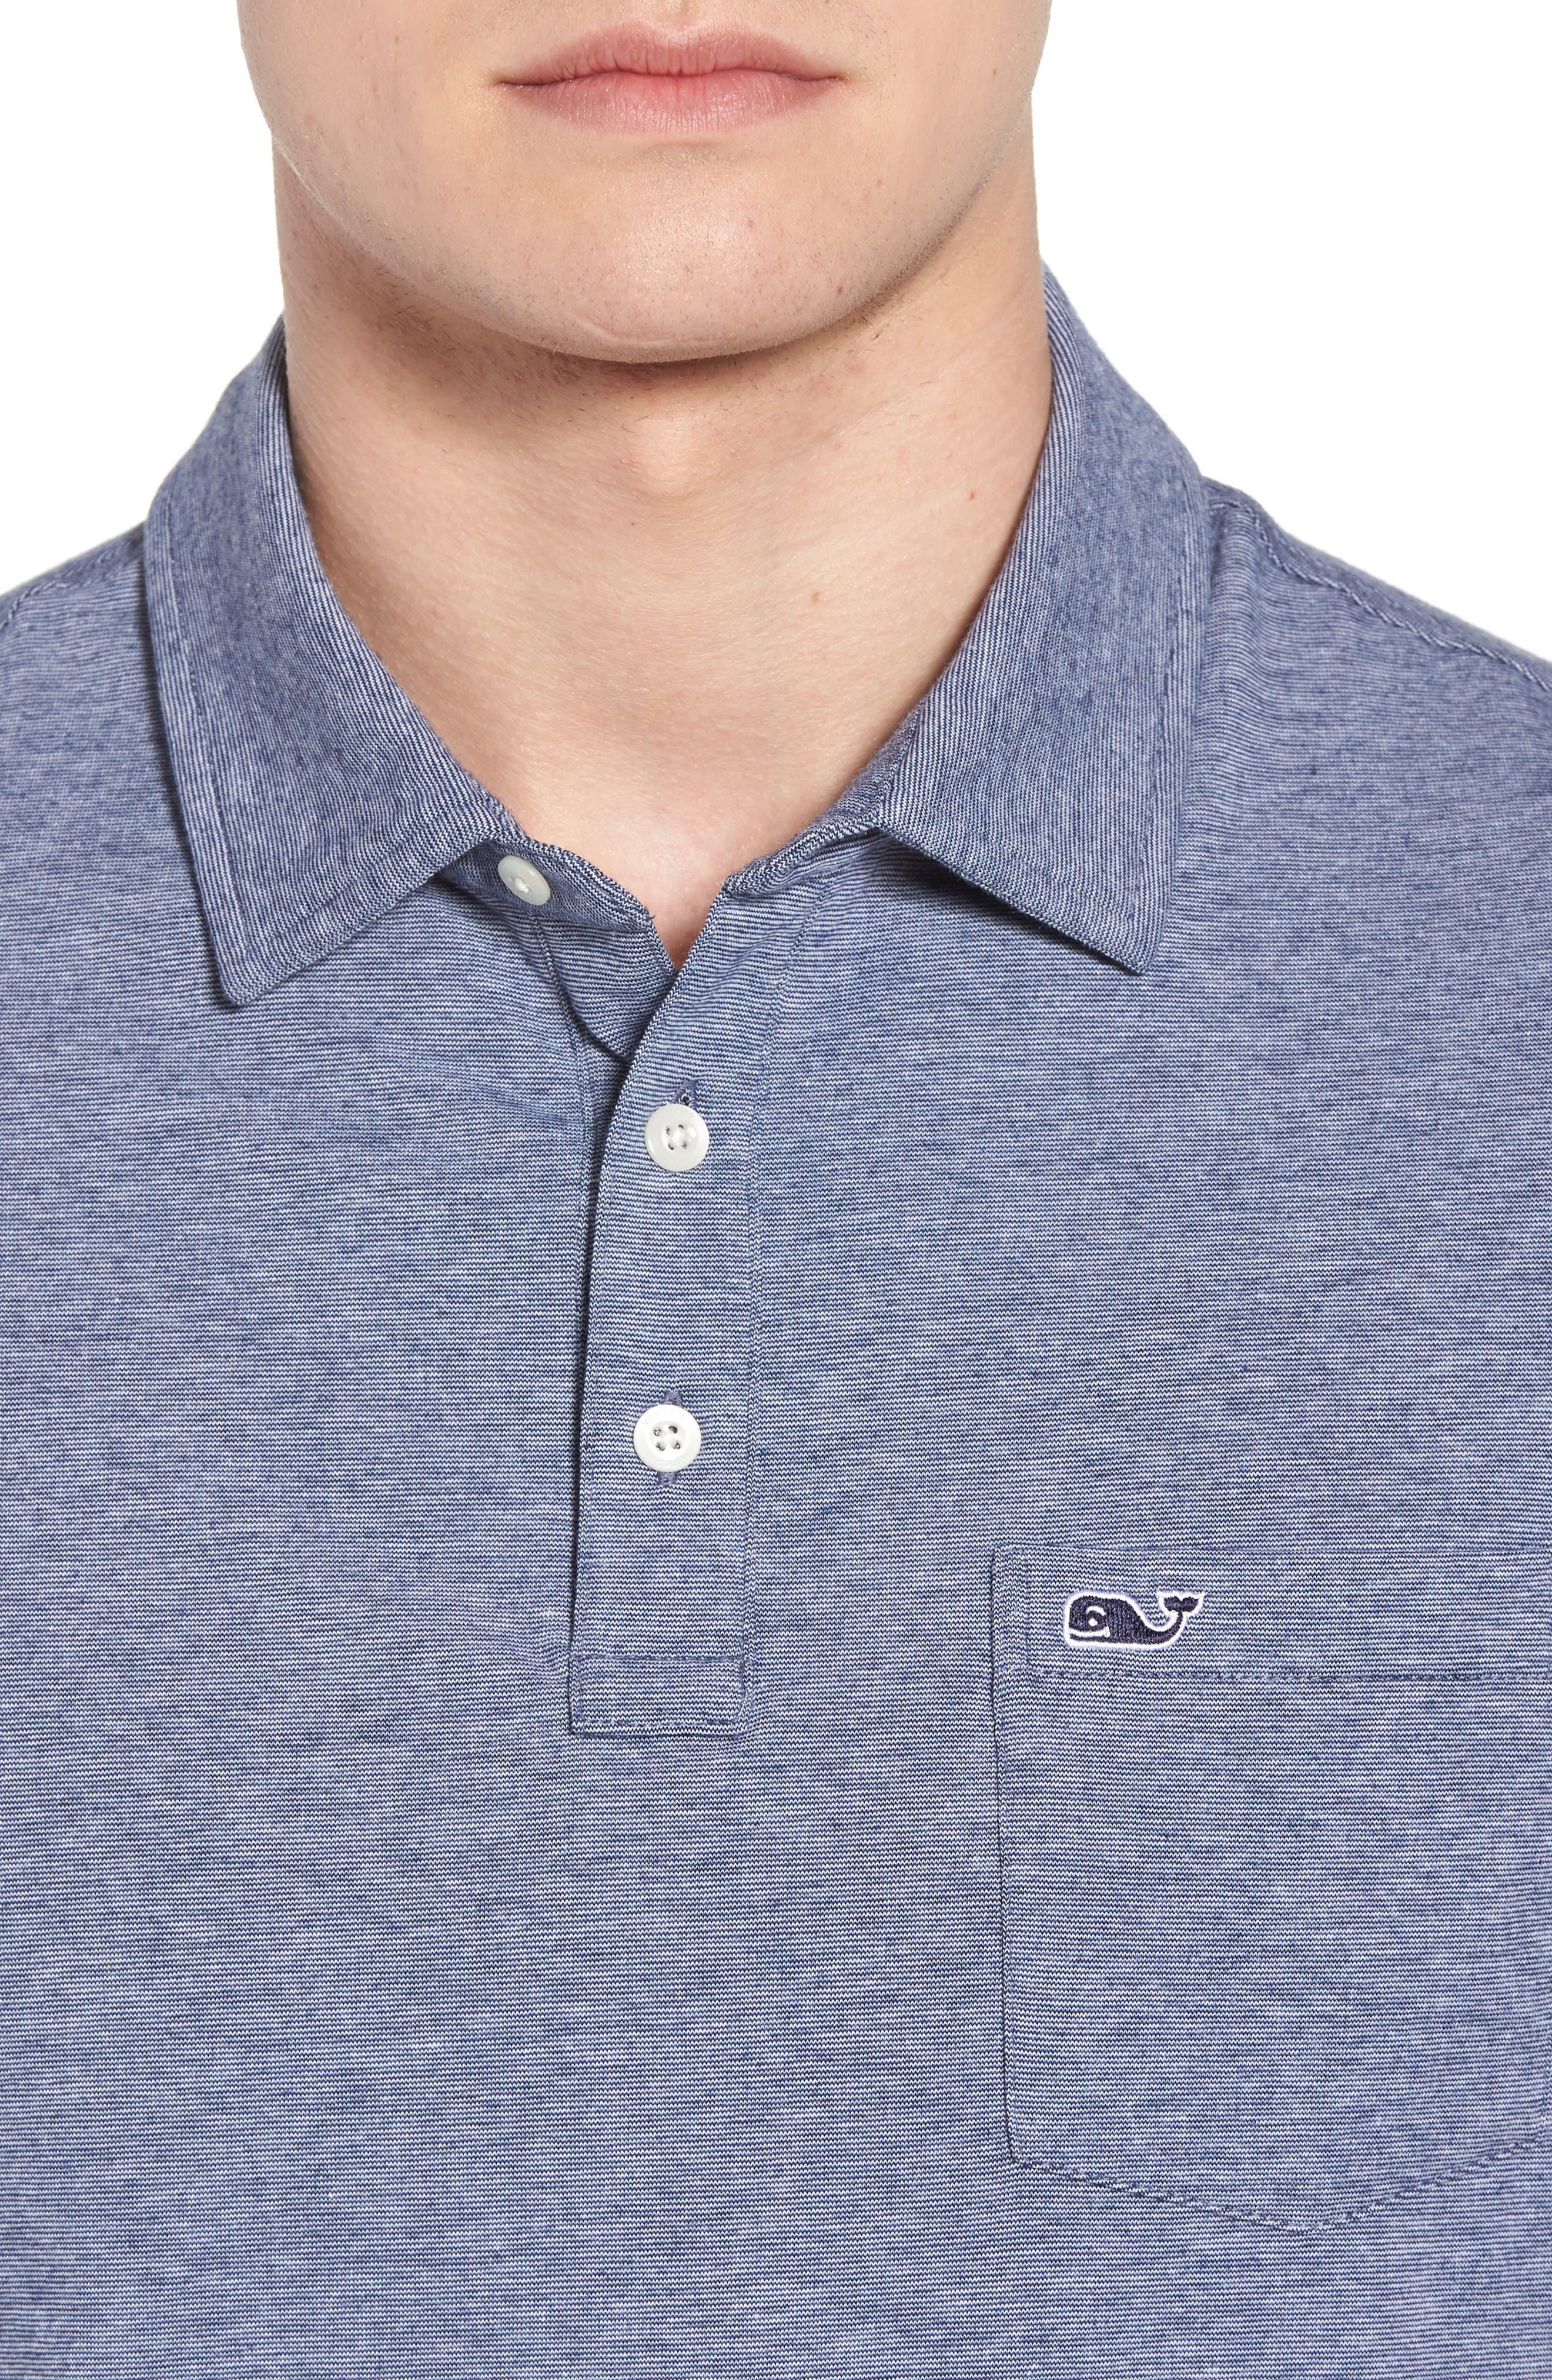 VINEYARD VINES,                             Edgartown Polo Shirt,                             Alternate thumbnail 4, color,                             DEEP BAY